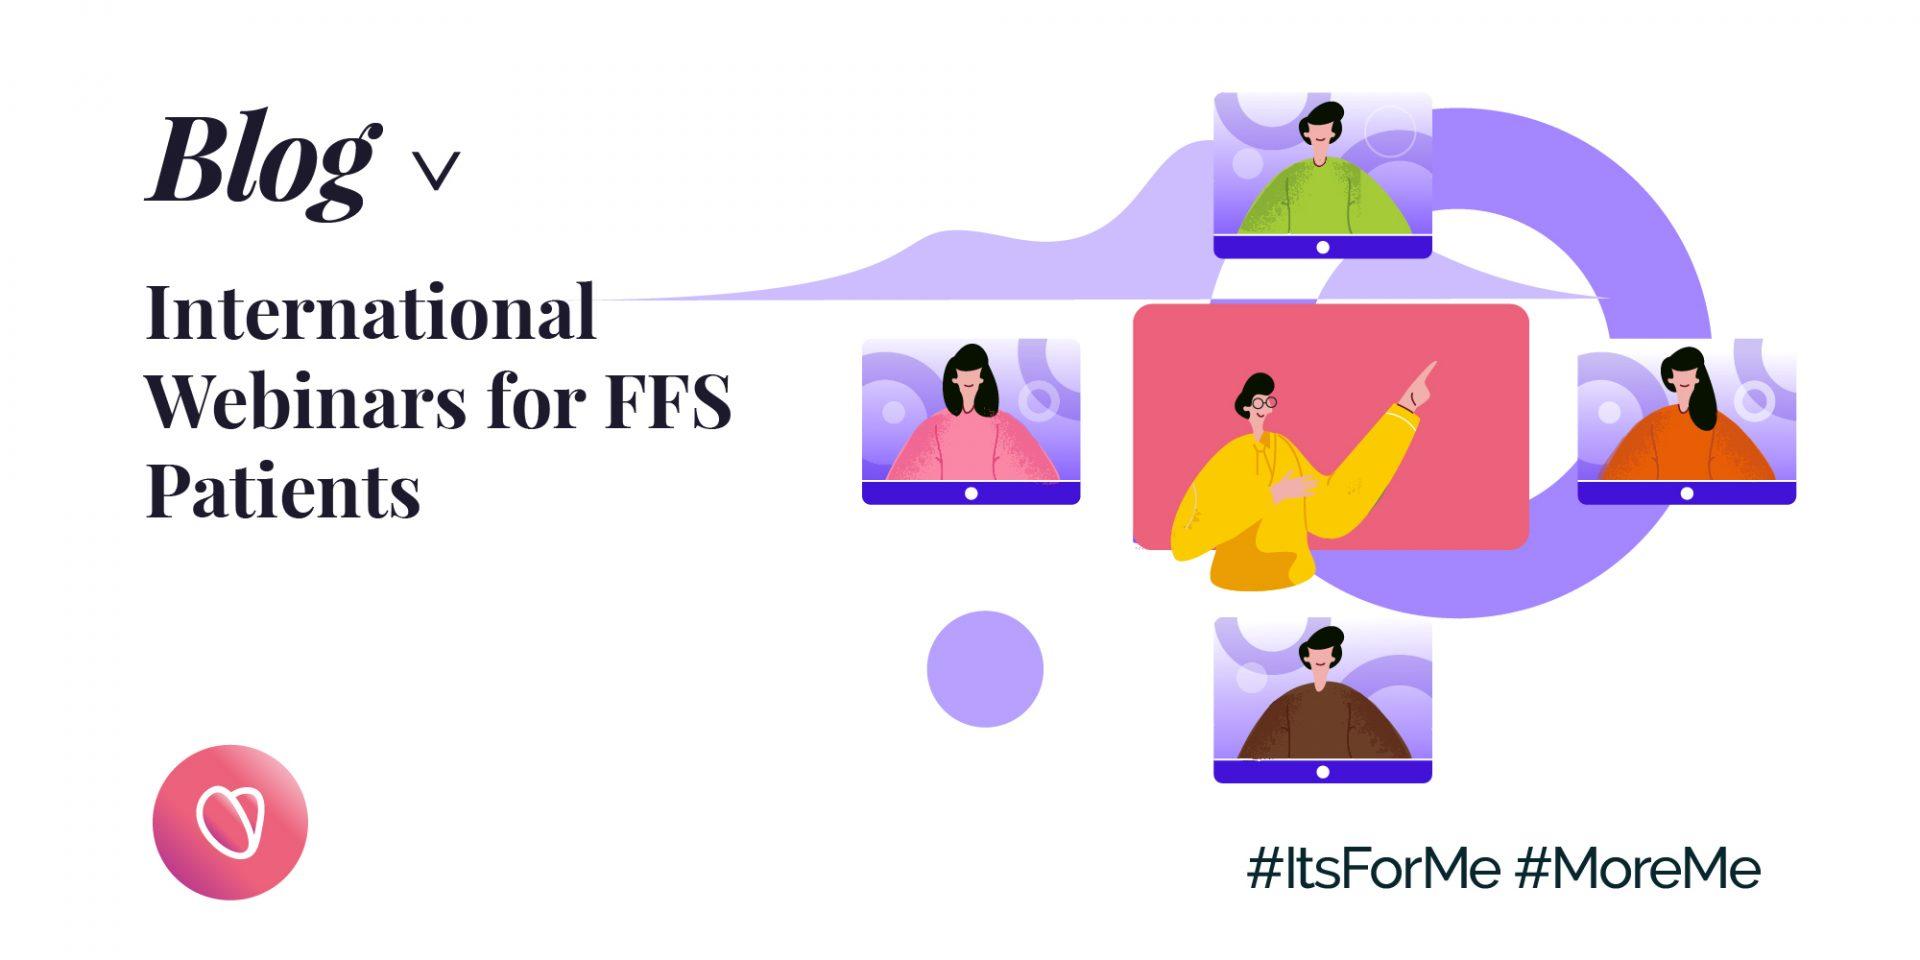 International FFS Webinars connect patients